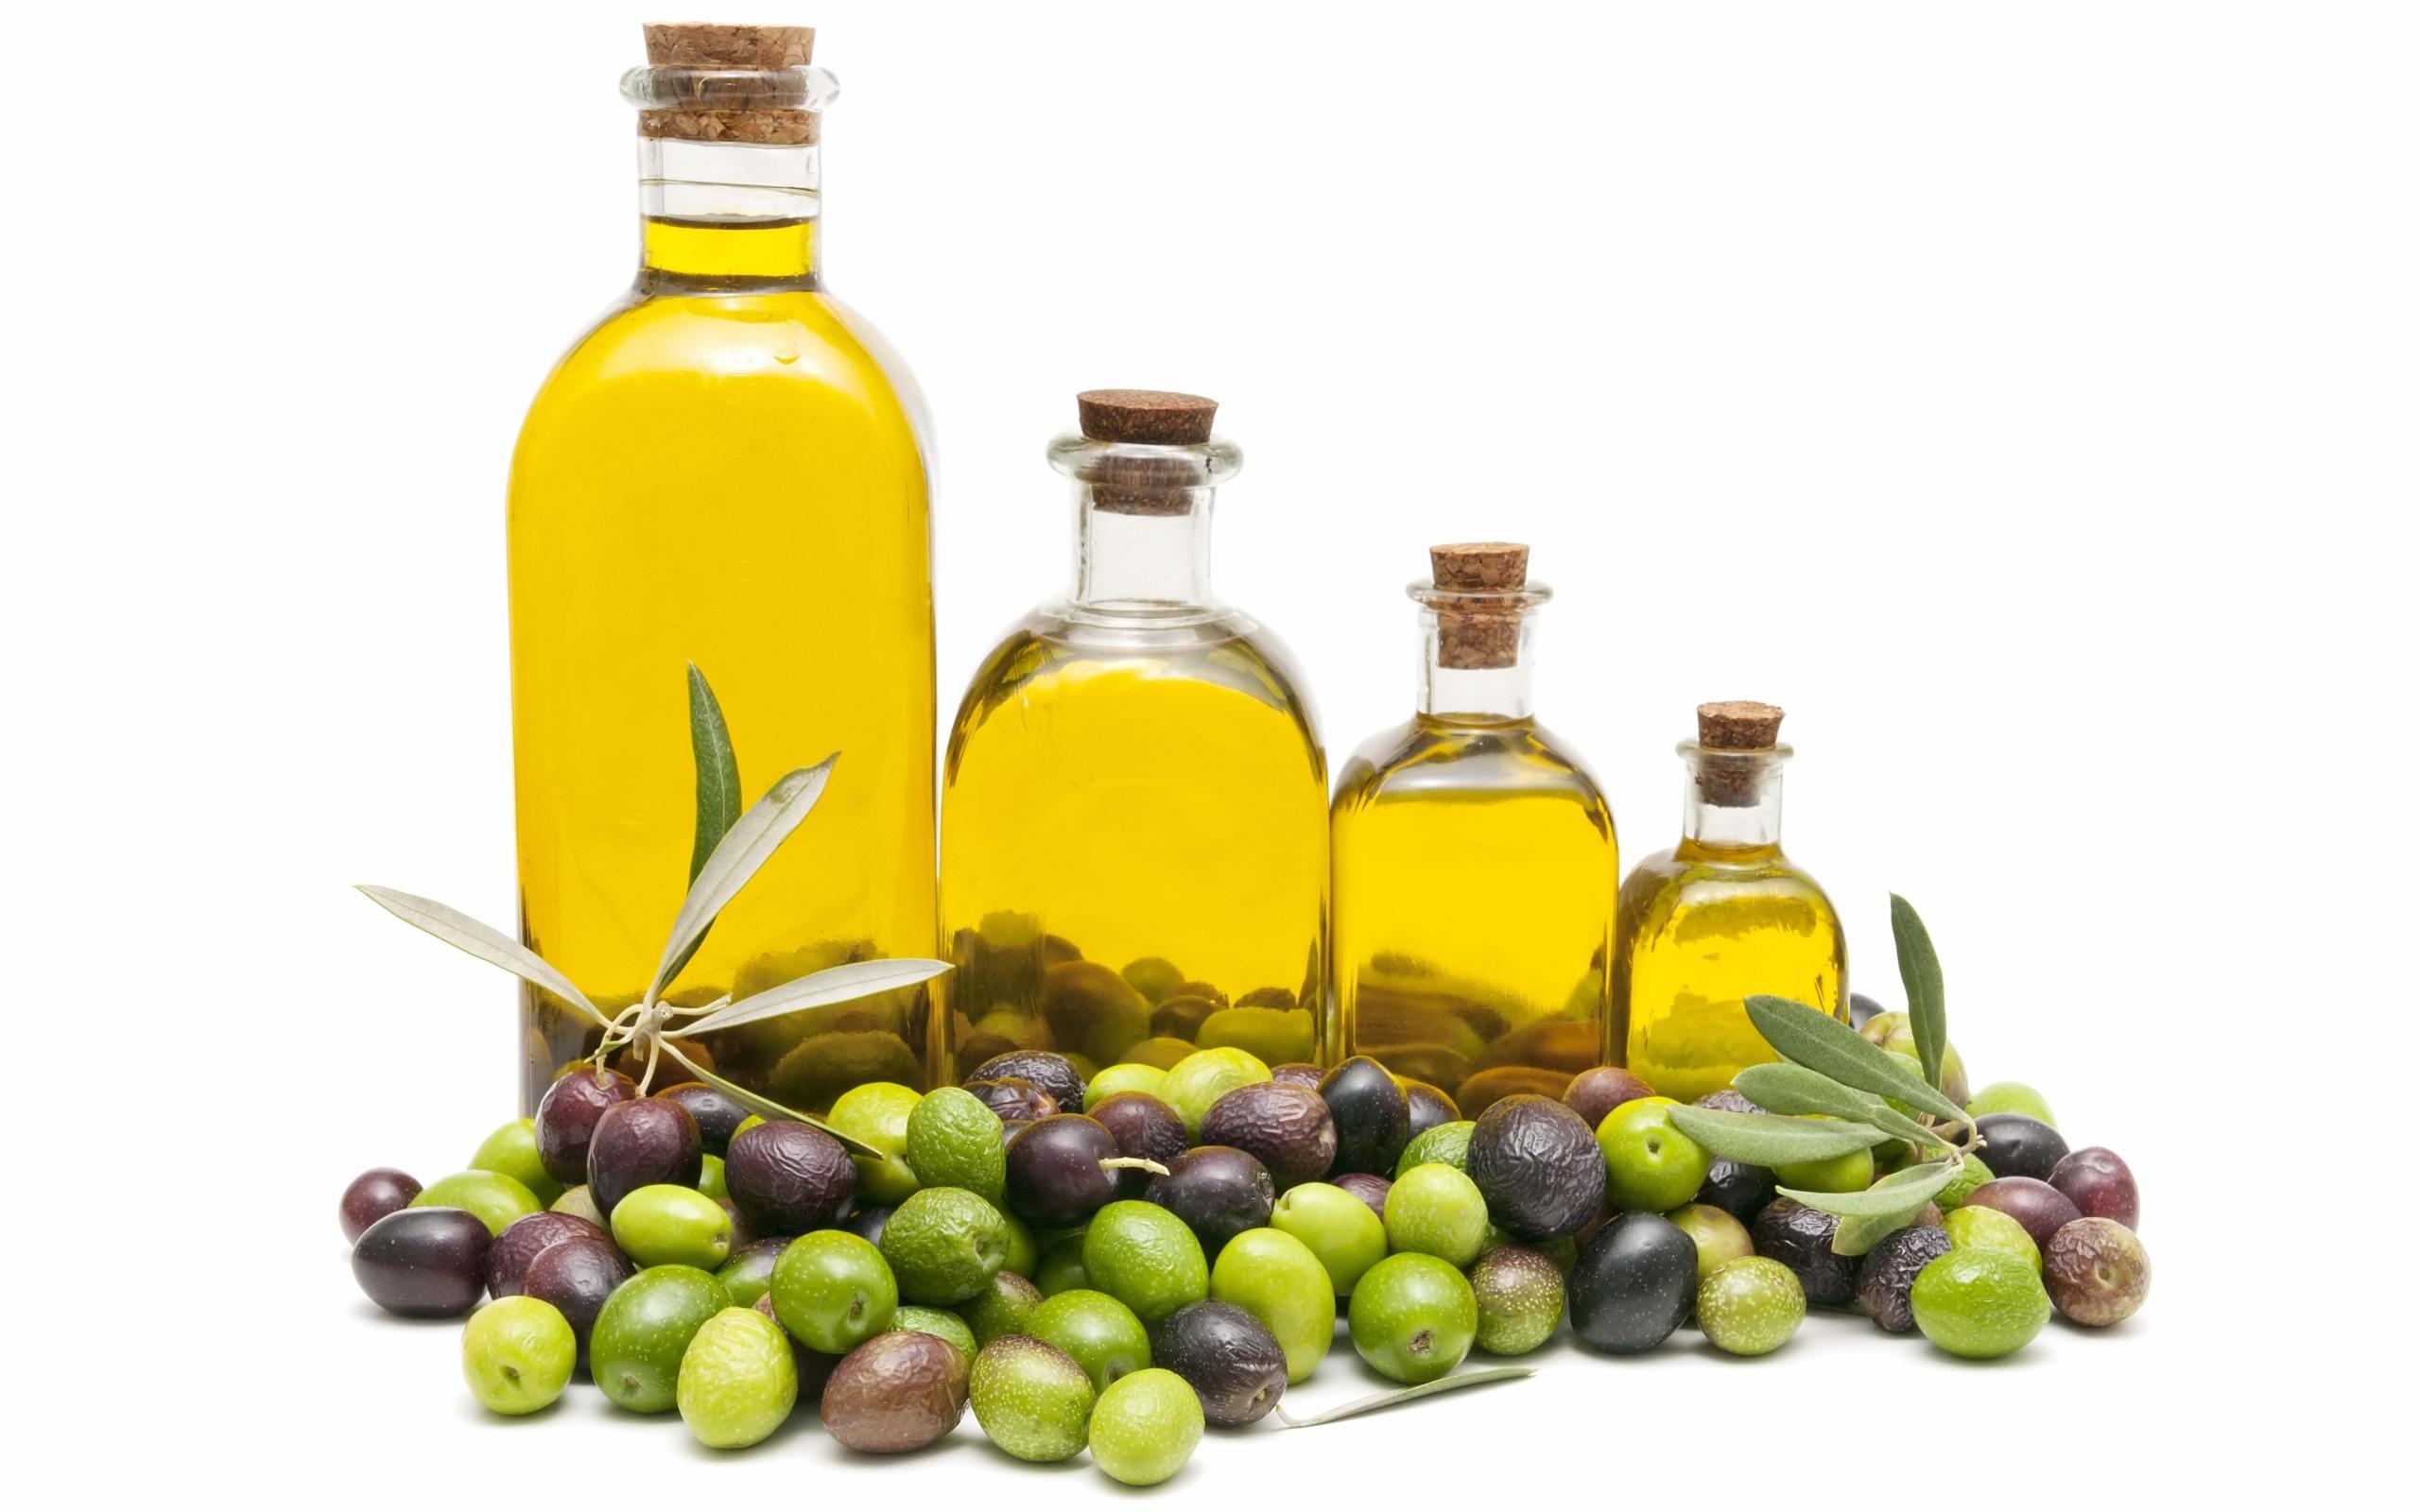 Chăm sóc da bằng dầu oliu